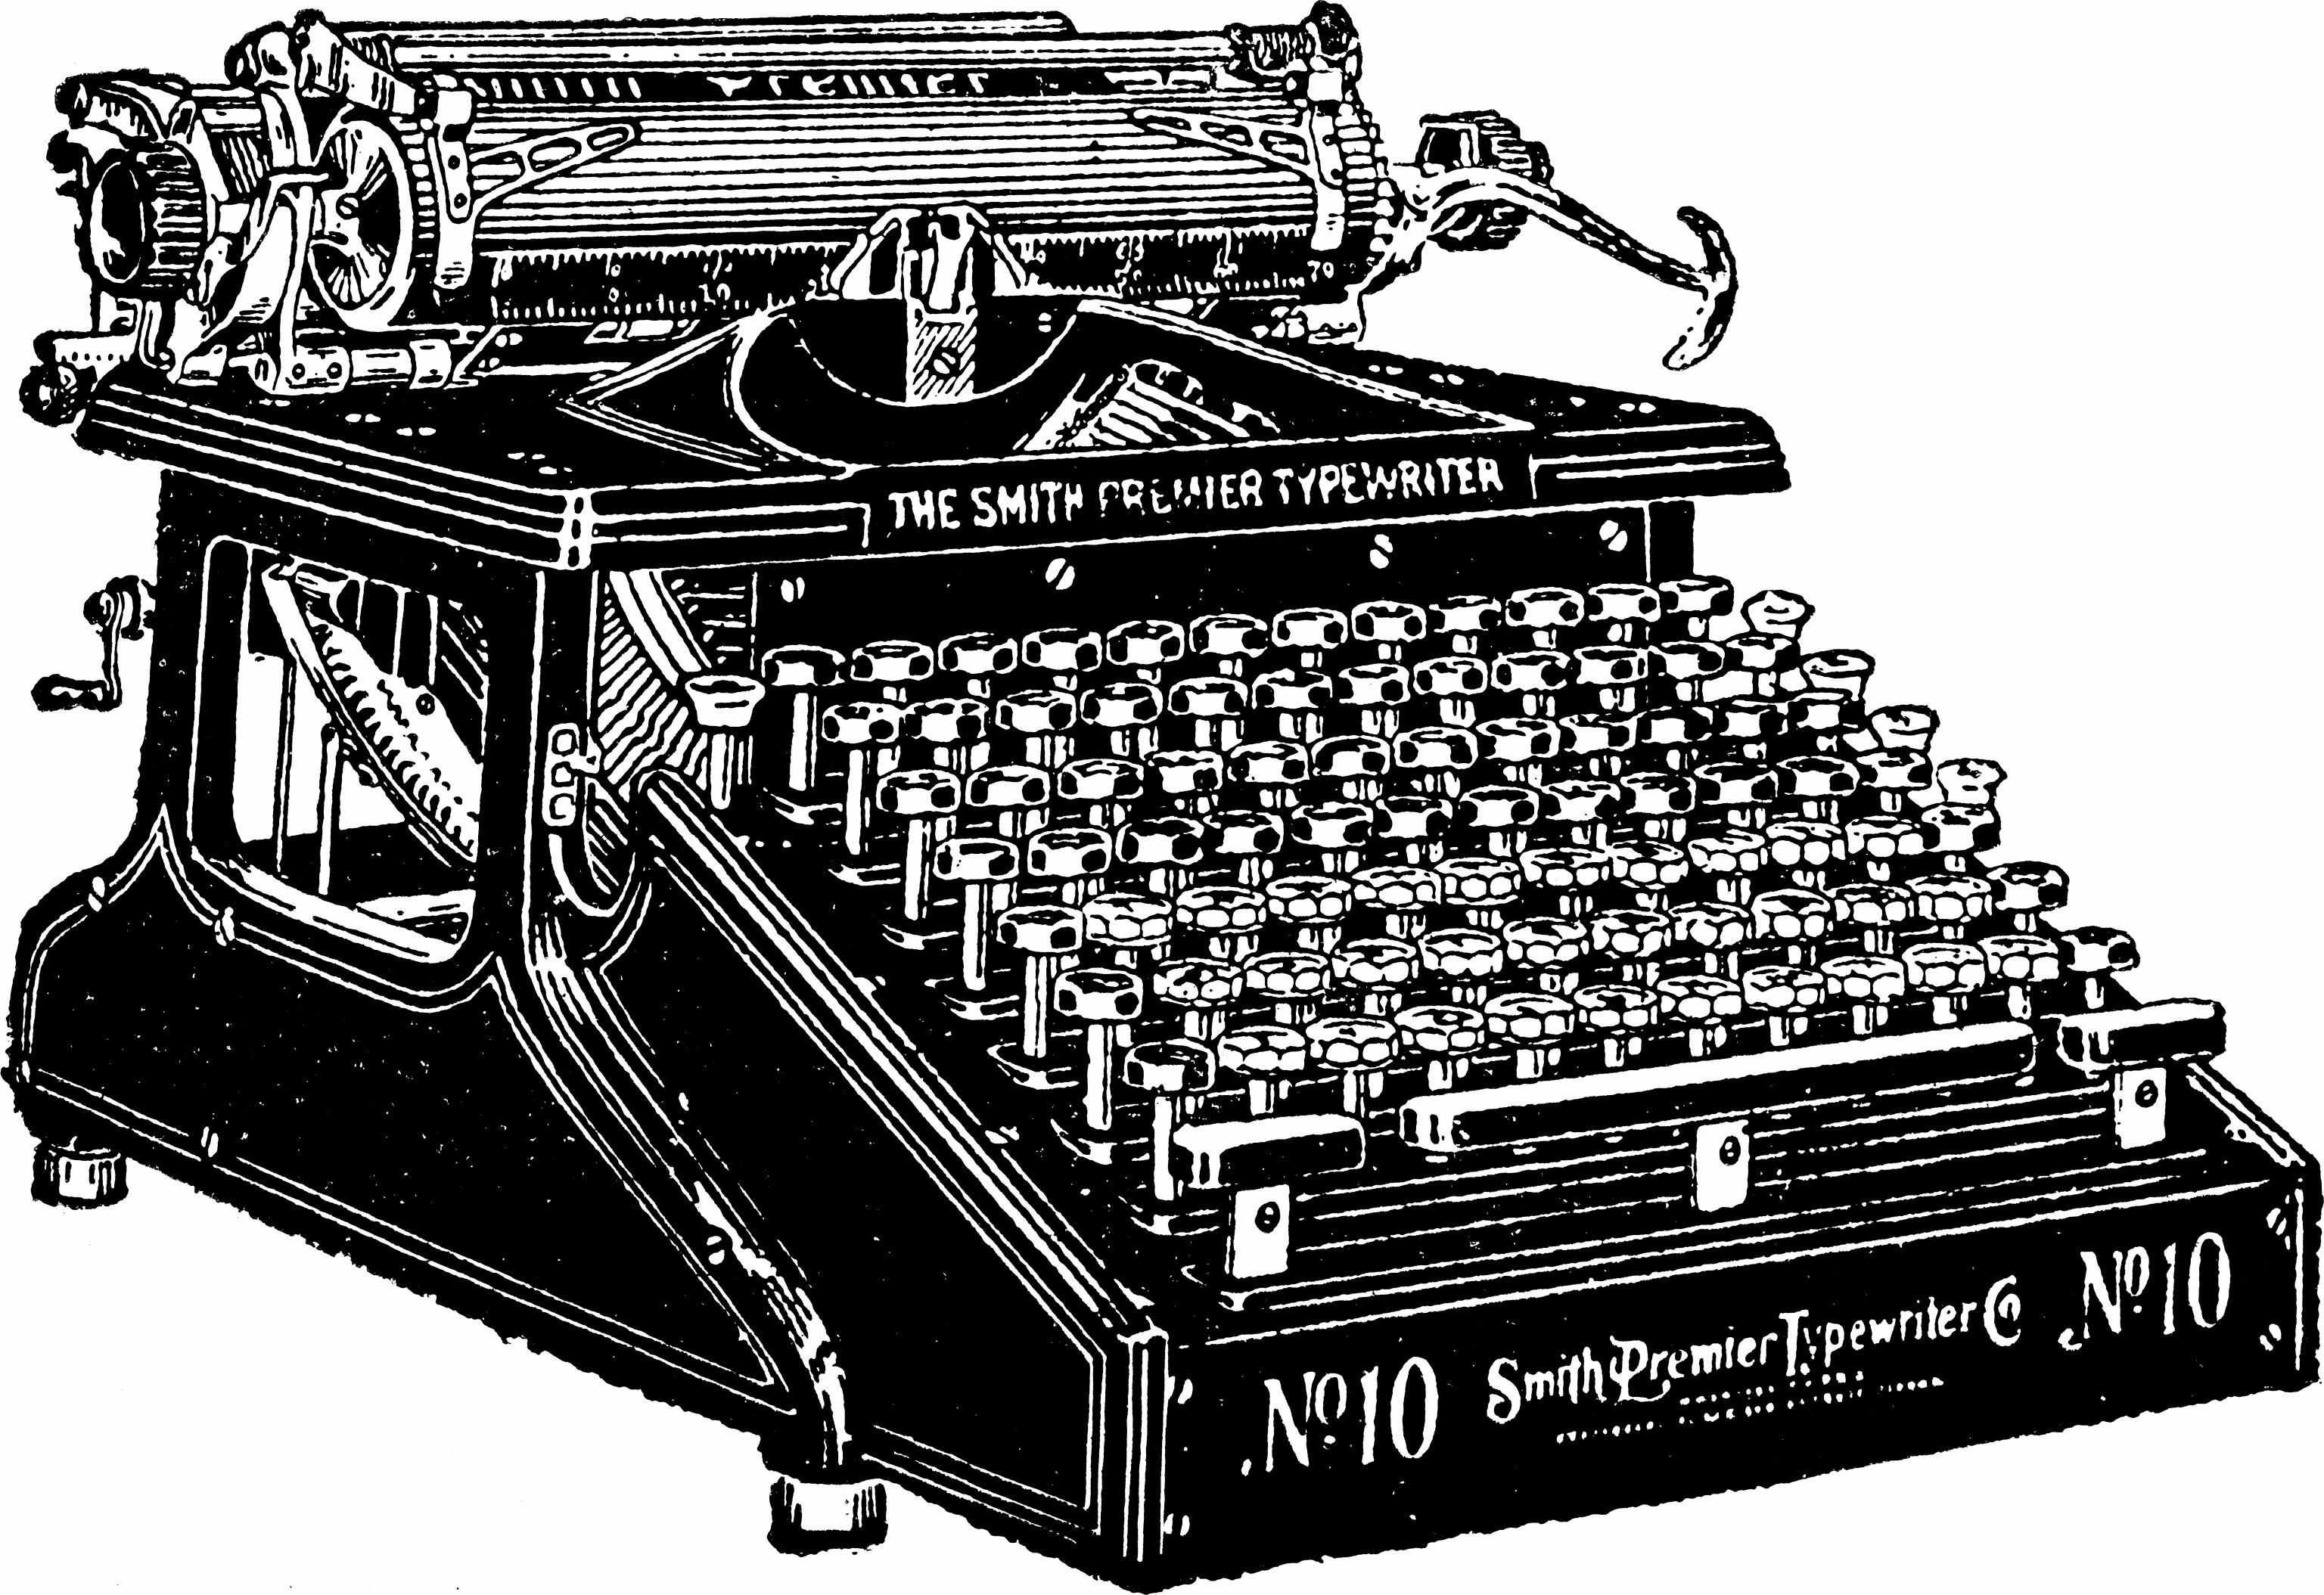 Smith Premier Typewriter, 1910